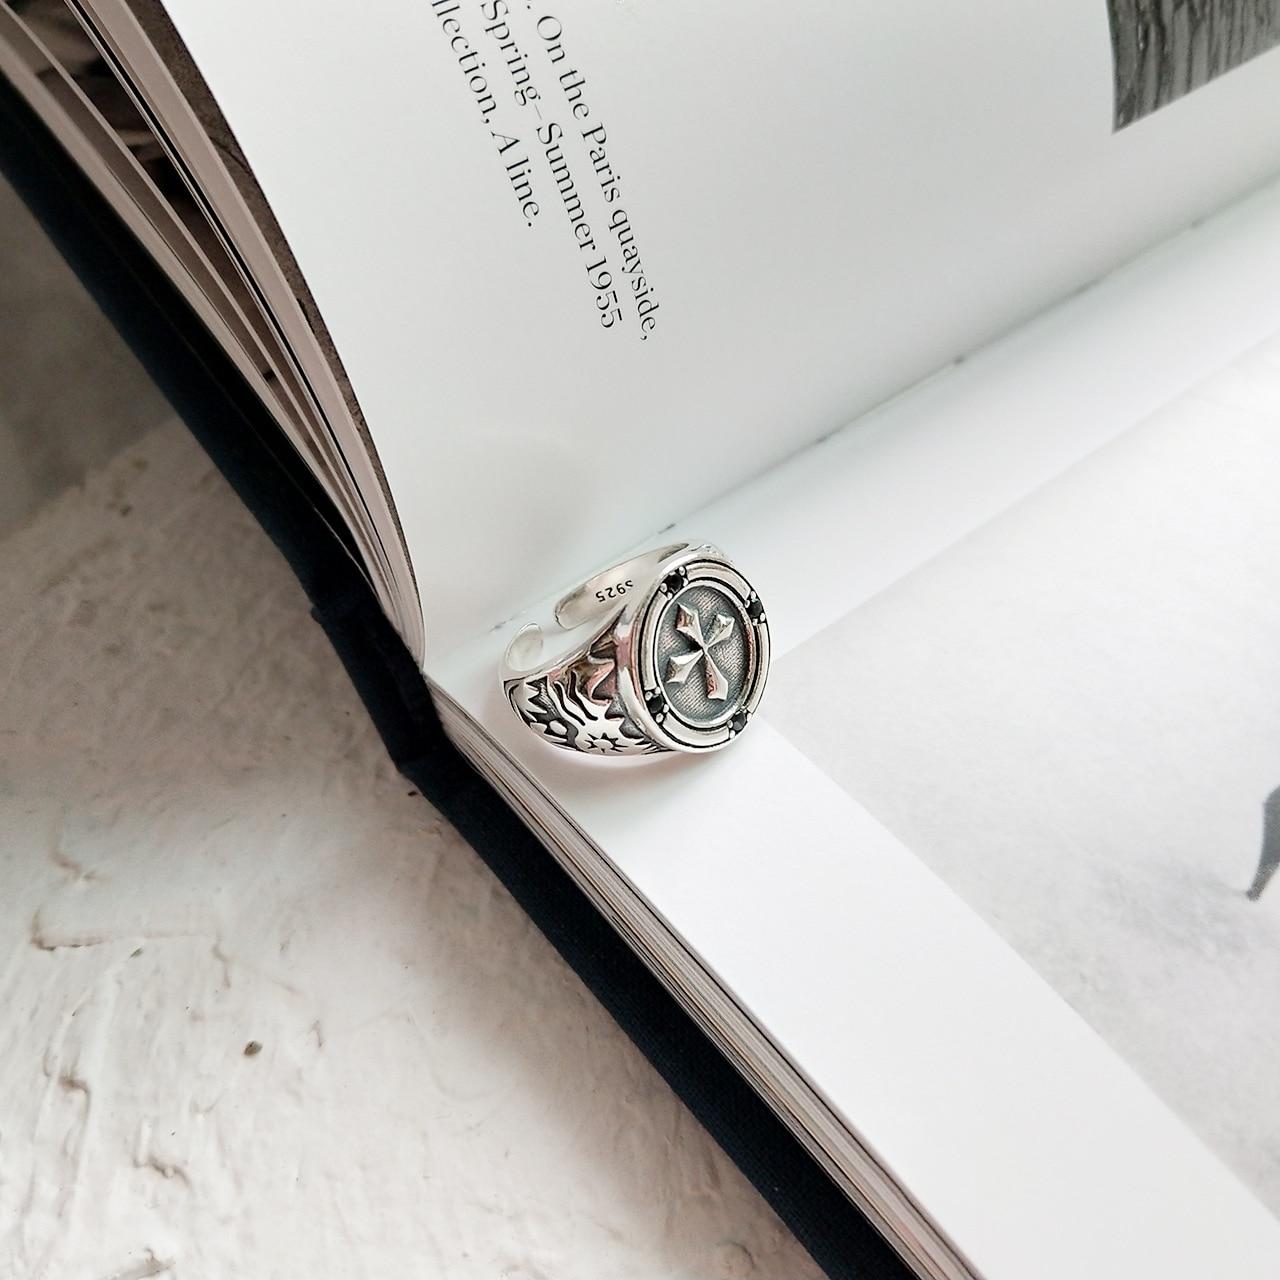 Anillo coreano de Plata de Ley 925 anillo de Cruz Retro anillo de plata de apertura Vintage anillo de Cruz Retro al por mayor